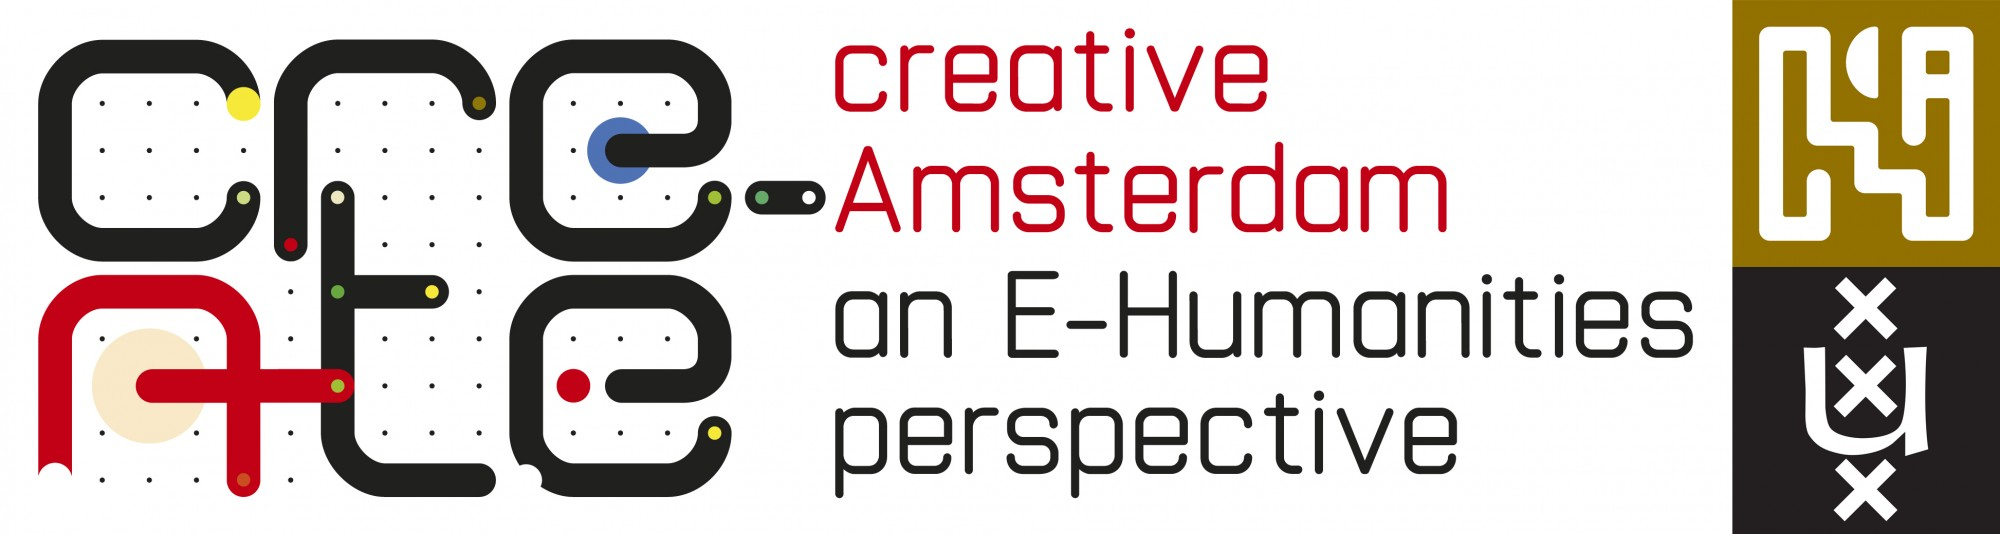 CREATECreative Amsterdam: An E-Humanities Perspective